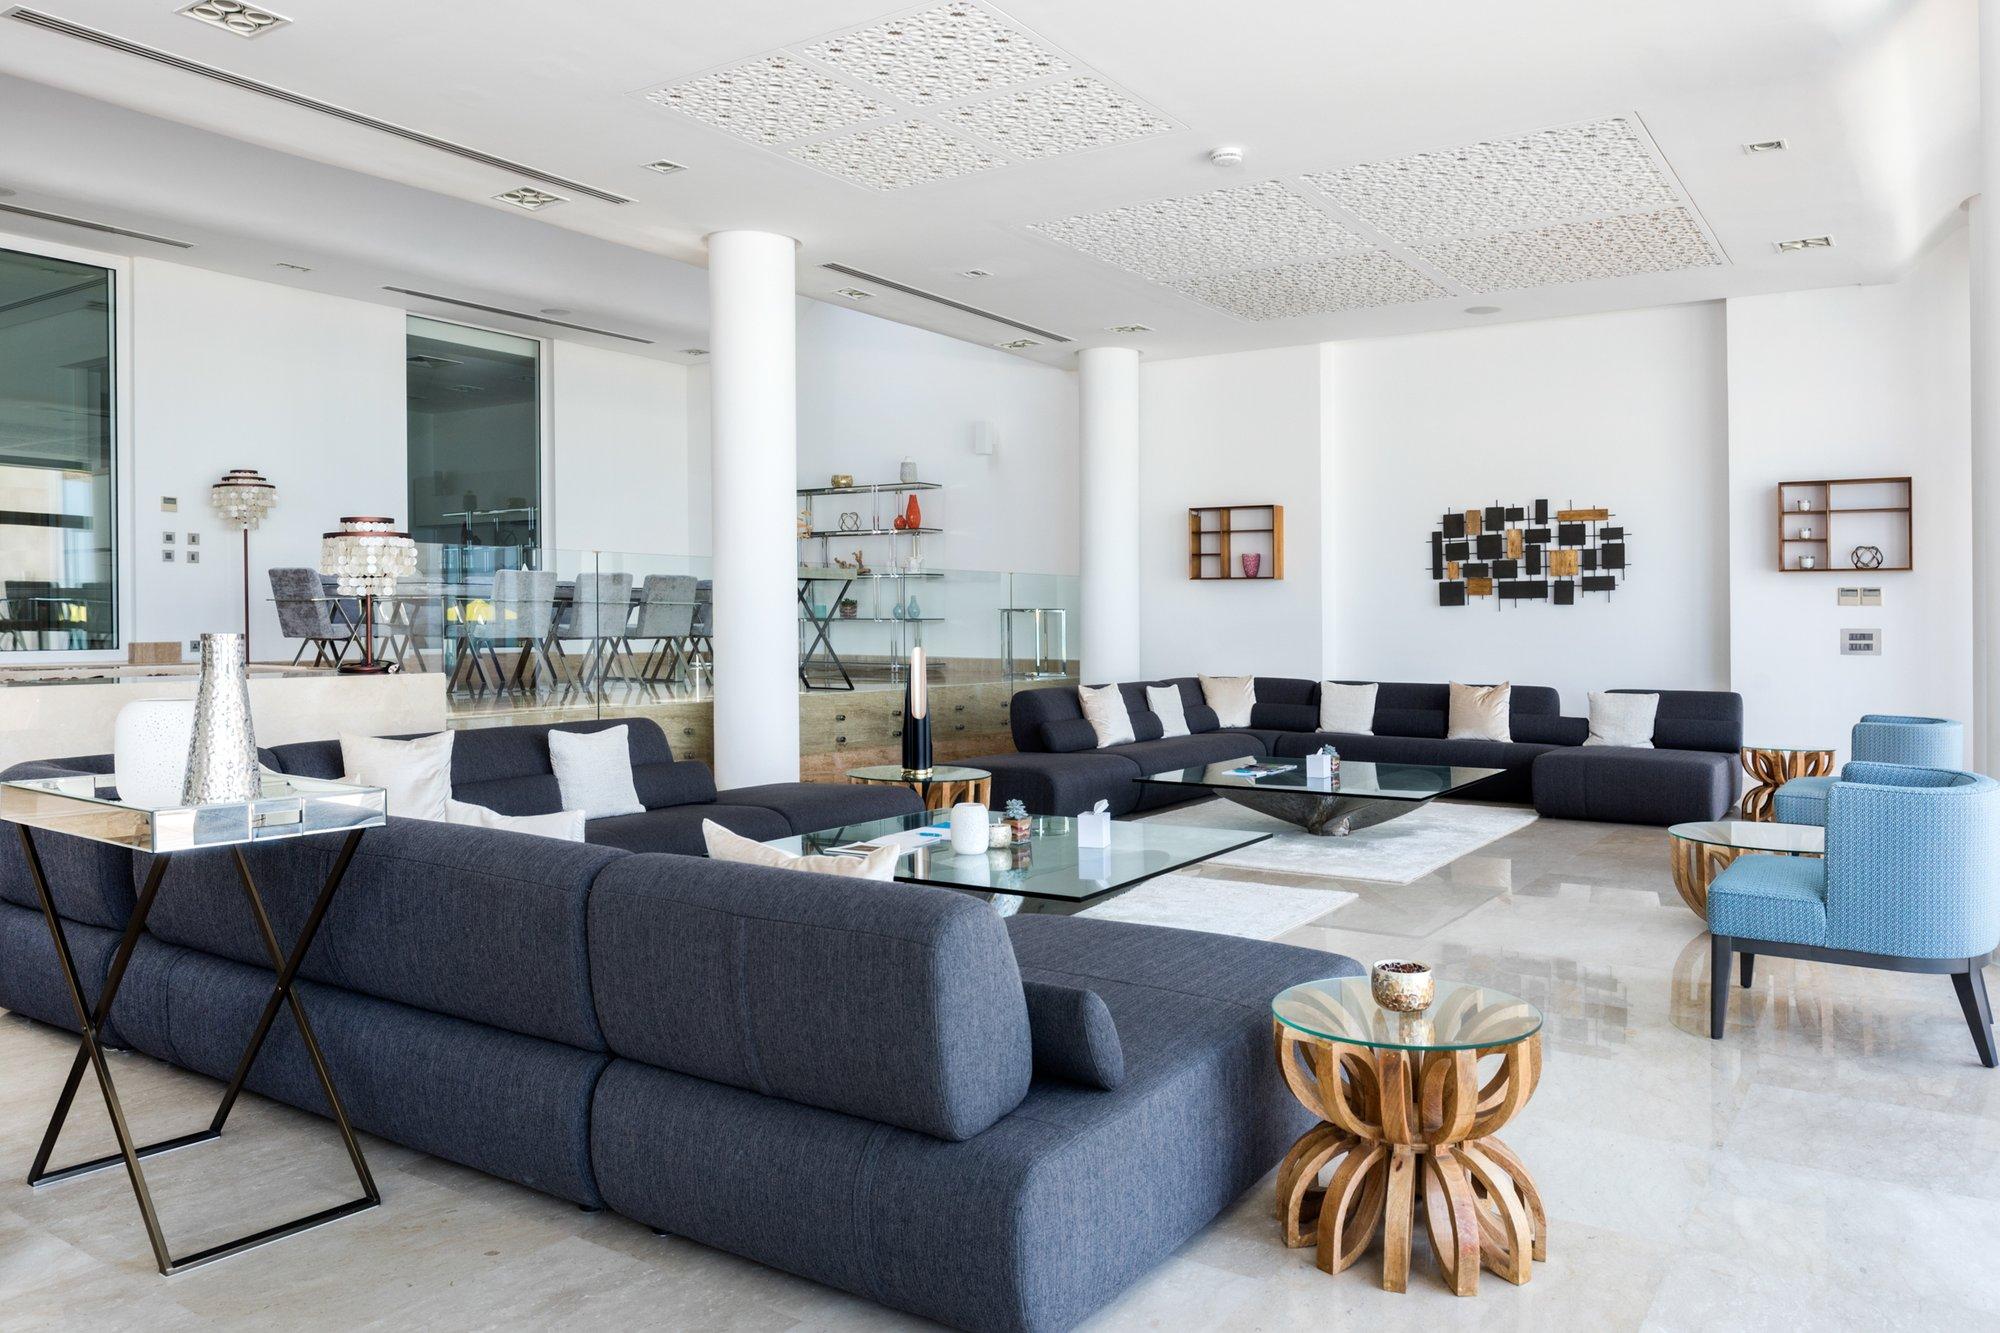 House in Jazeerat Nourai, Abu Dhabi, United Arab Emirates 1